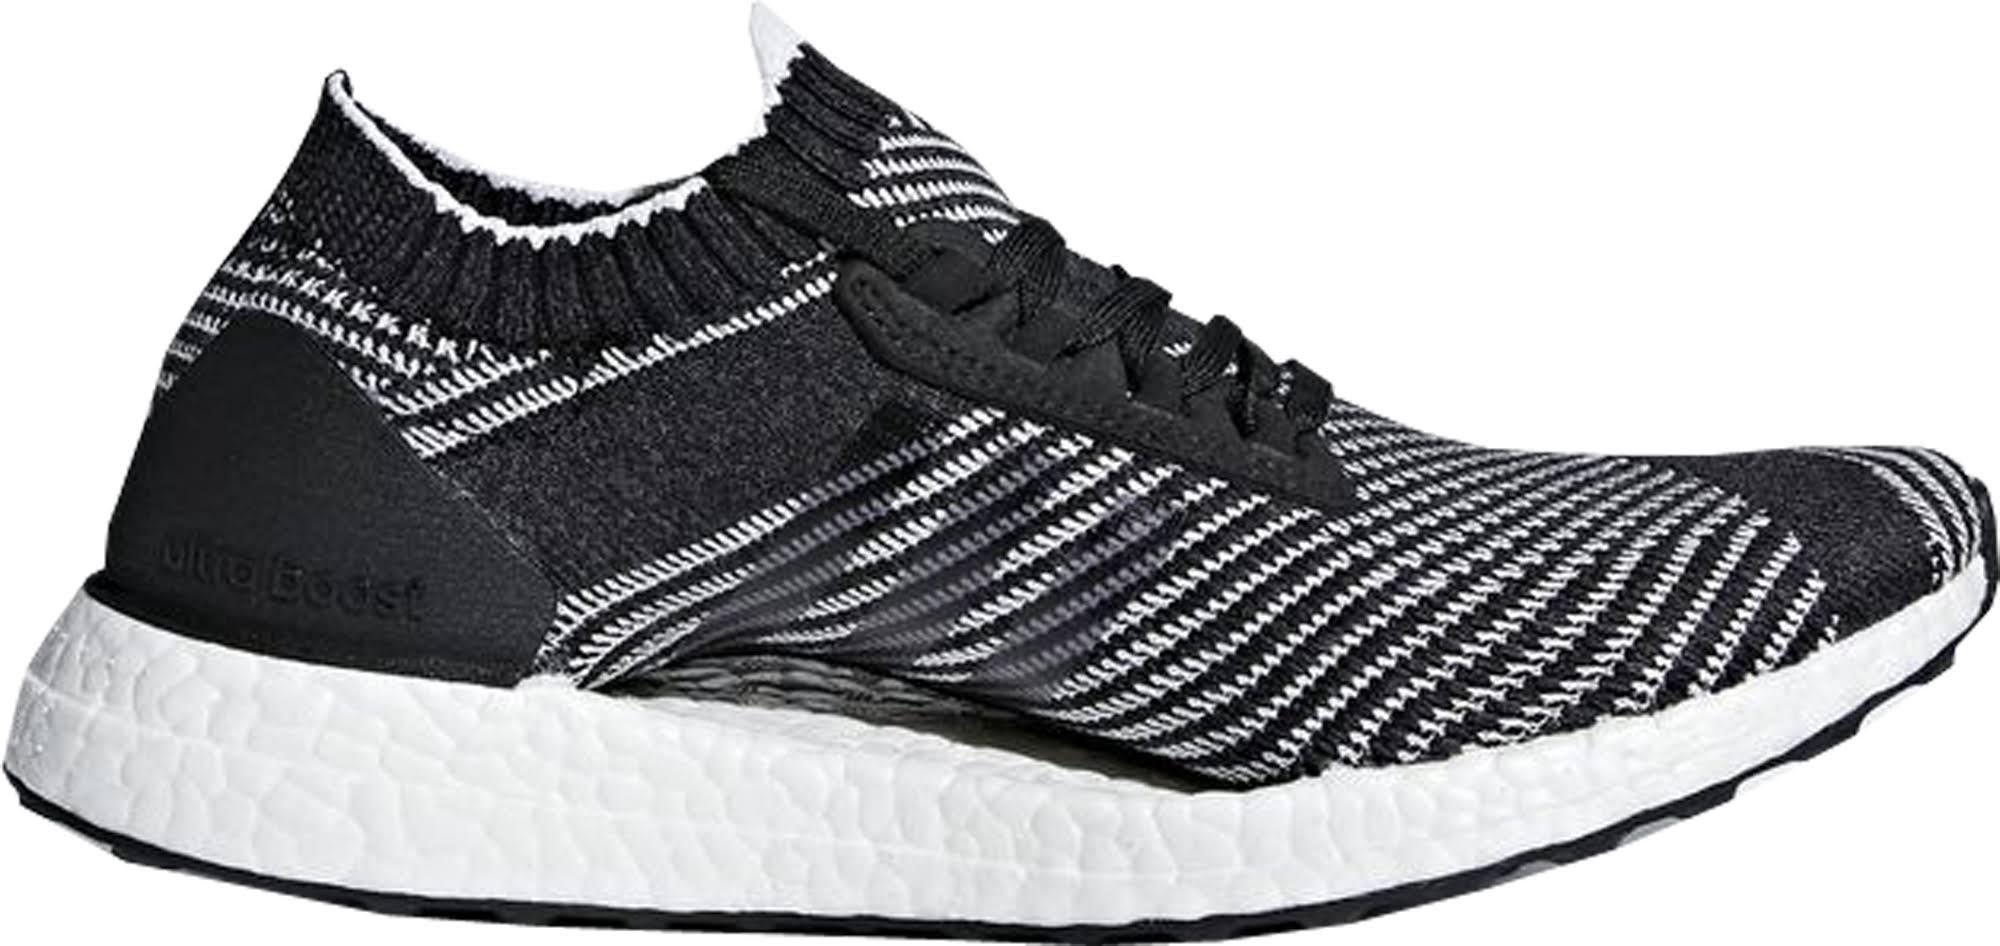 Adidas Ultraboost x Core Black Grey (w)